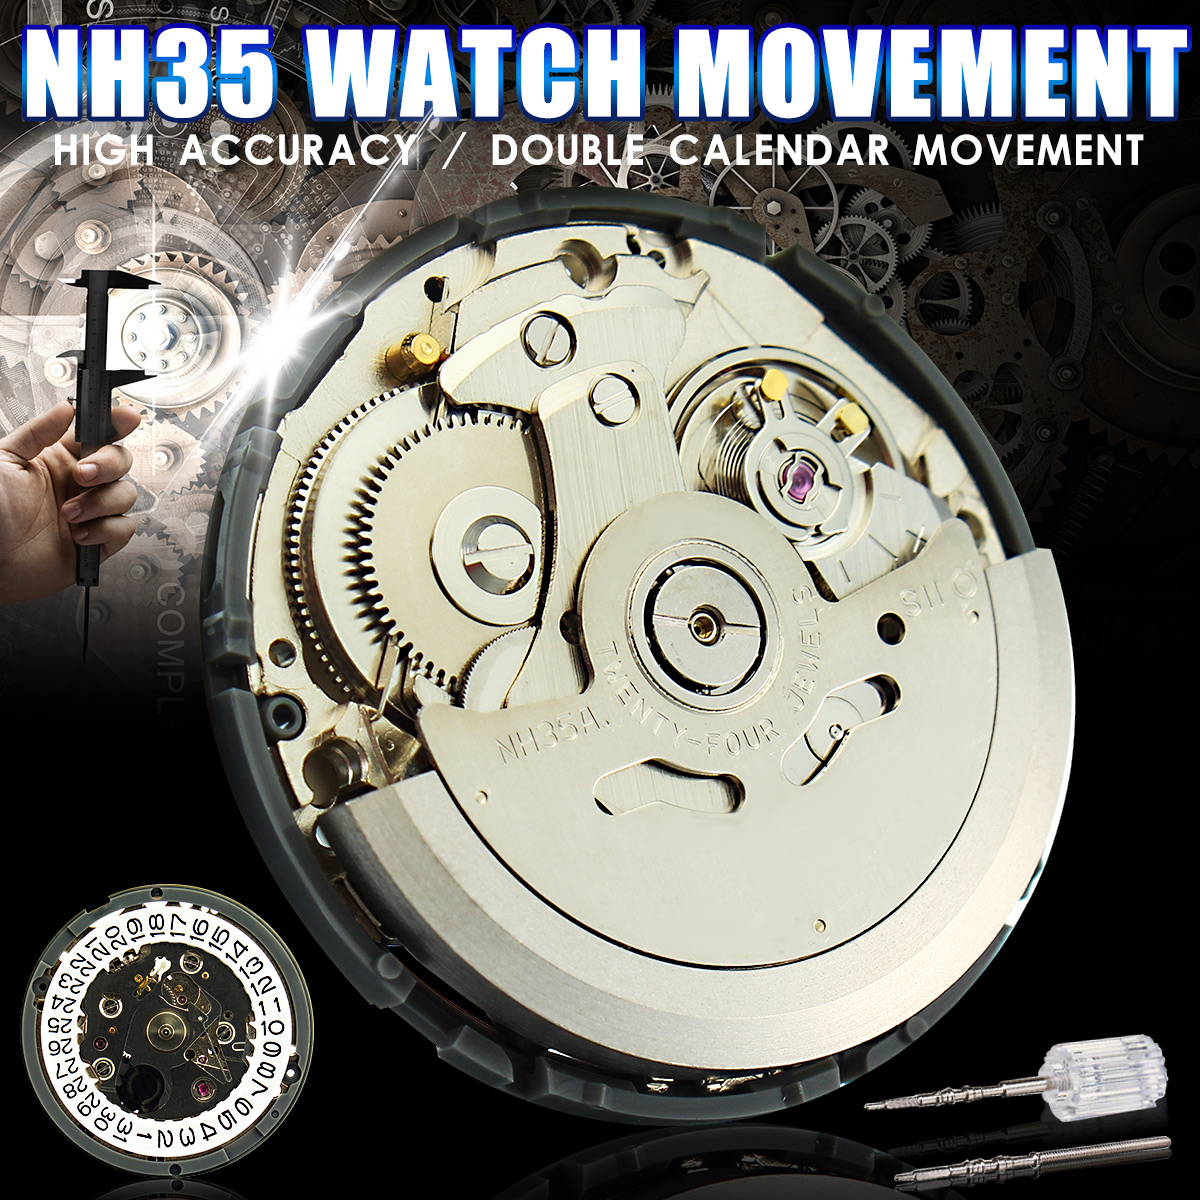 Japan Genuine NH35 Wristwatch Movement Mechanical Watch Movement Automatic Wholesale New ArrivalJapan Genuine NH35 Wristwatch Movement Mechanical Watch Movement Automatic Wholesale New Arrival